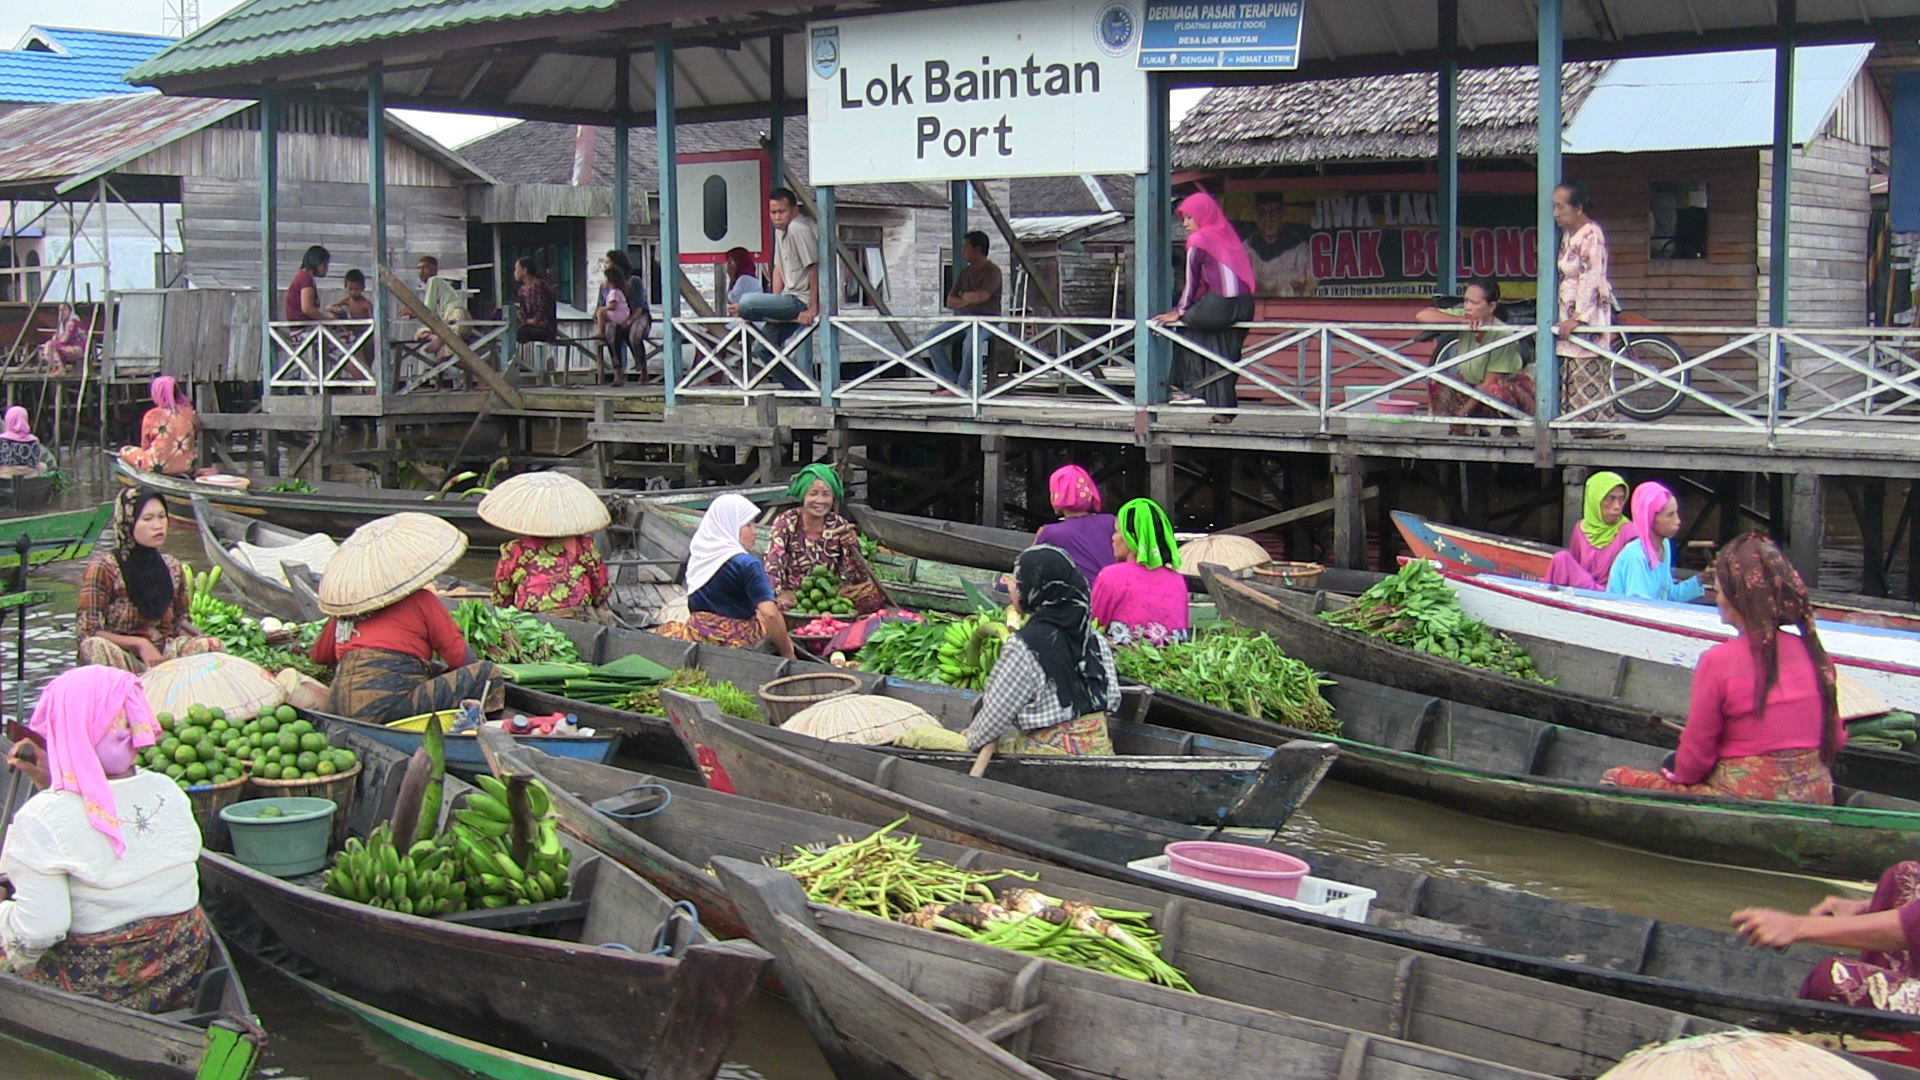 http://upload.wikimedia.org/wikipedia/commons/9/9a/Floating_Market_Lok_Baintan,_Lok_Baintan_Port.JPG